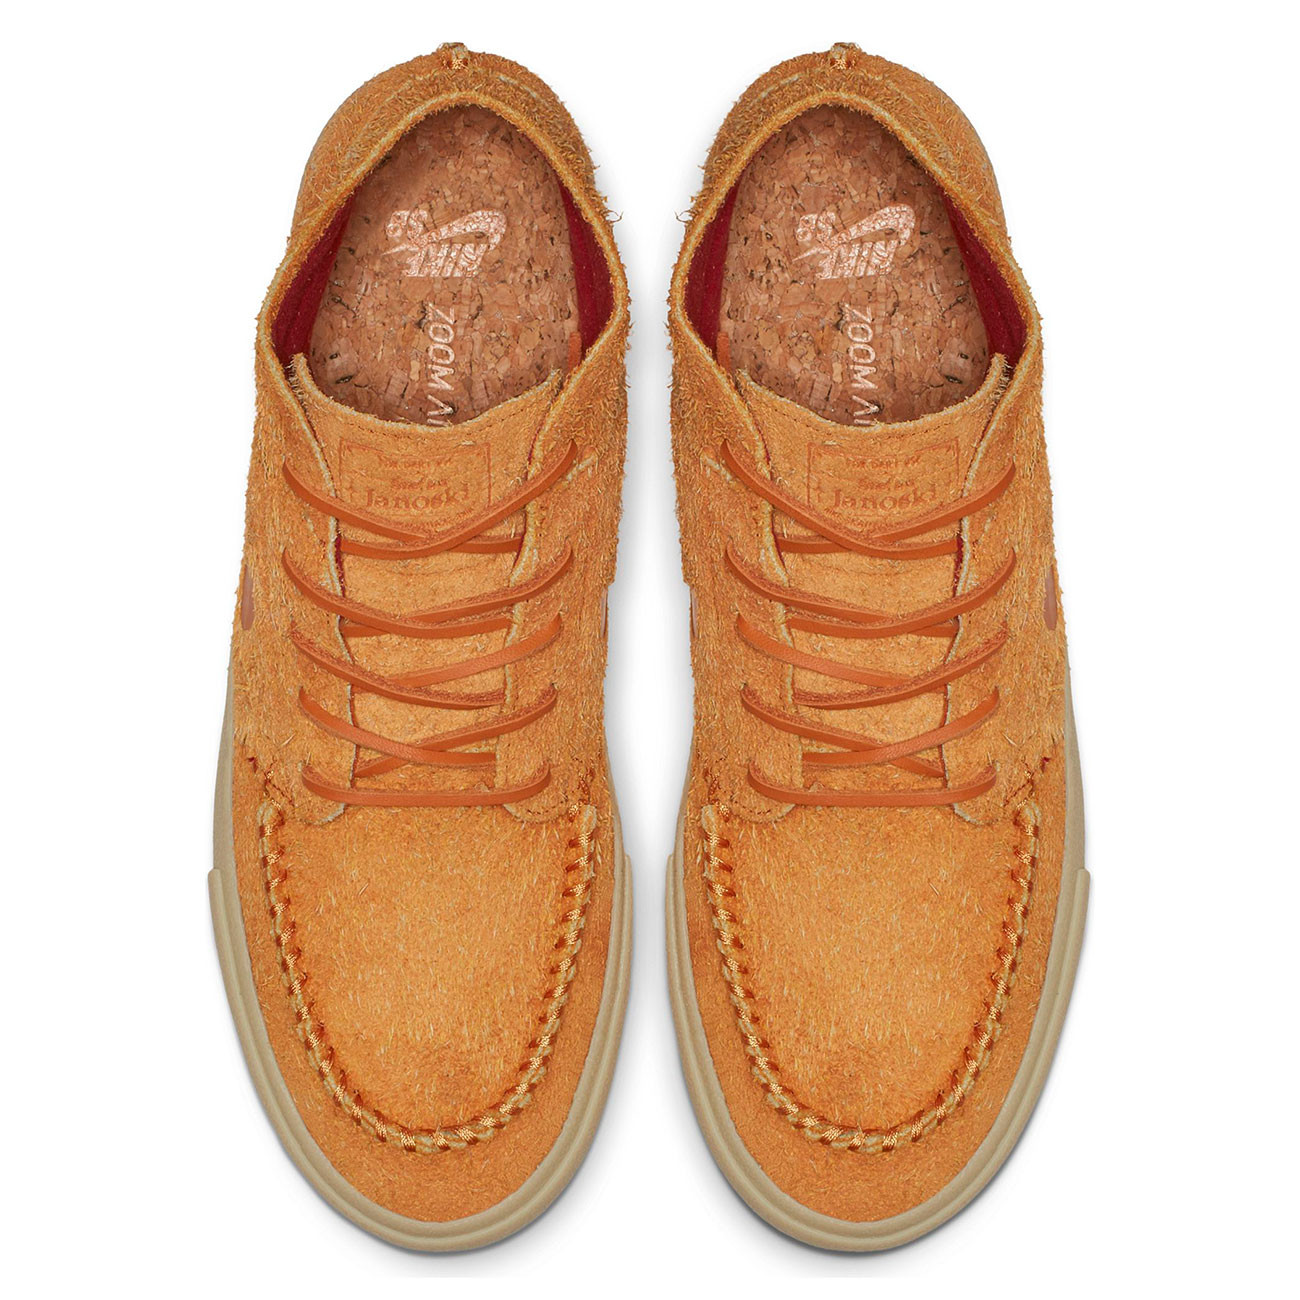 6962beba92a2 Sneakers Nike SB Zoom Stefan Janoski Mid Crafted cinder orange ...